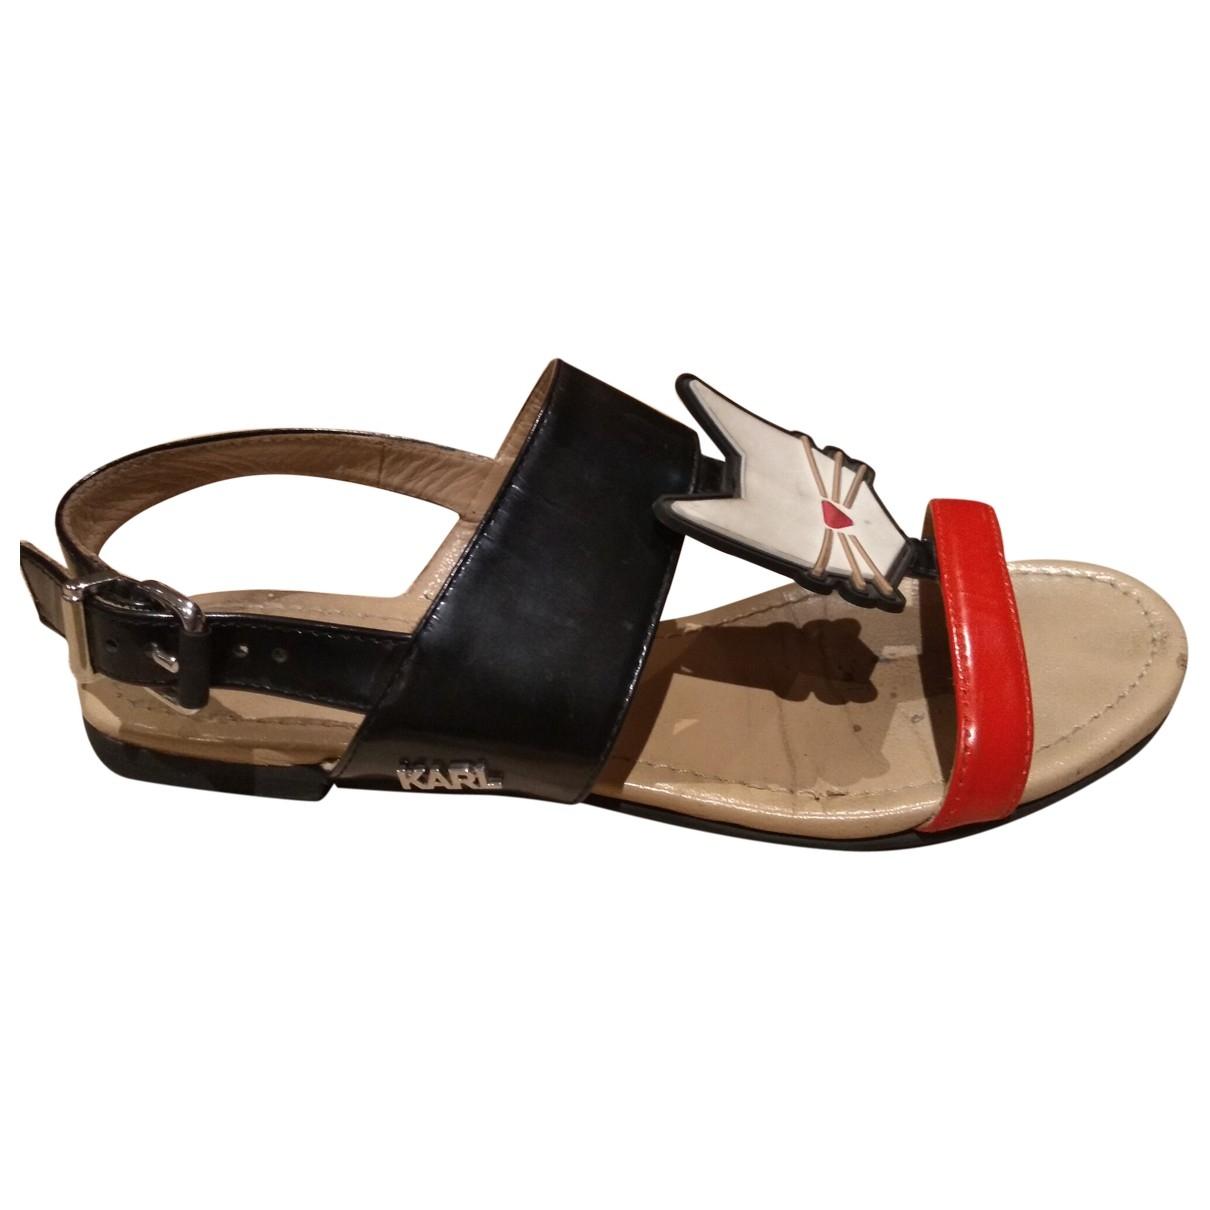 Karl Lagerfeld \N Black Leather Sandals for Women 36 EU